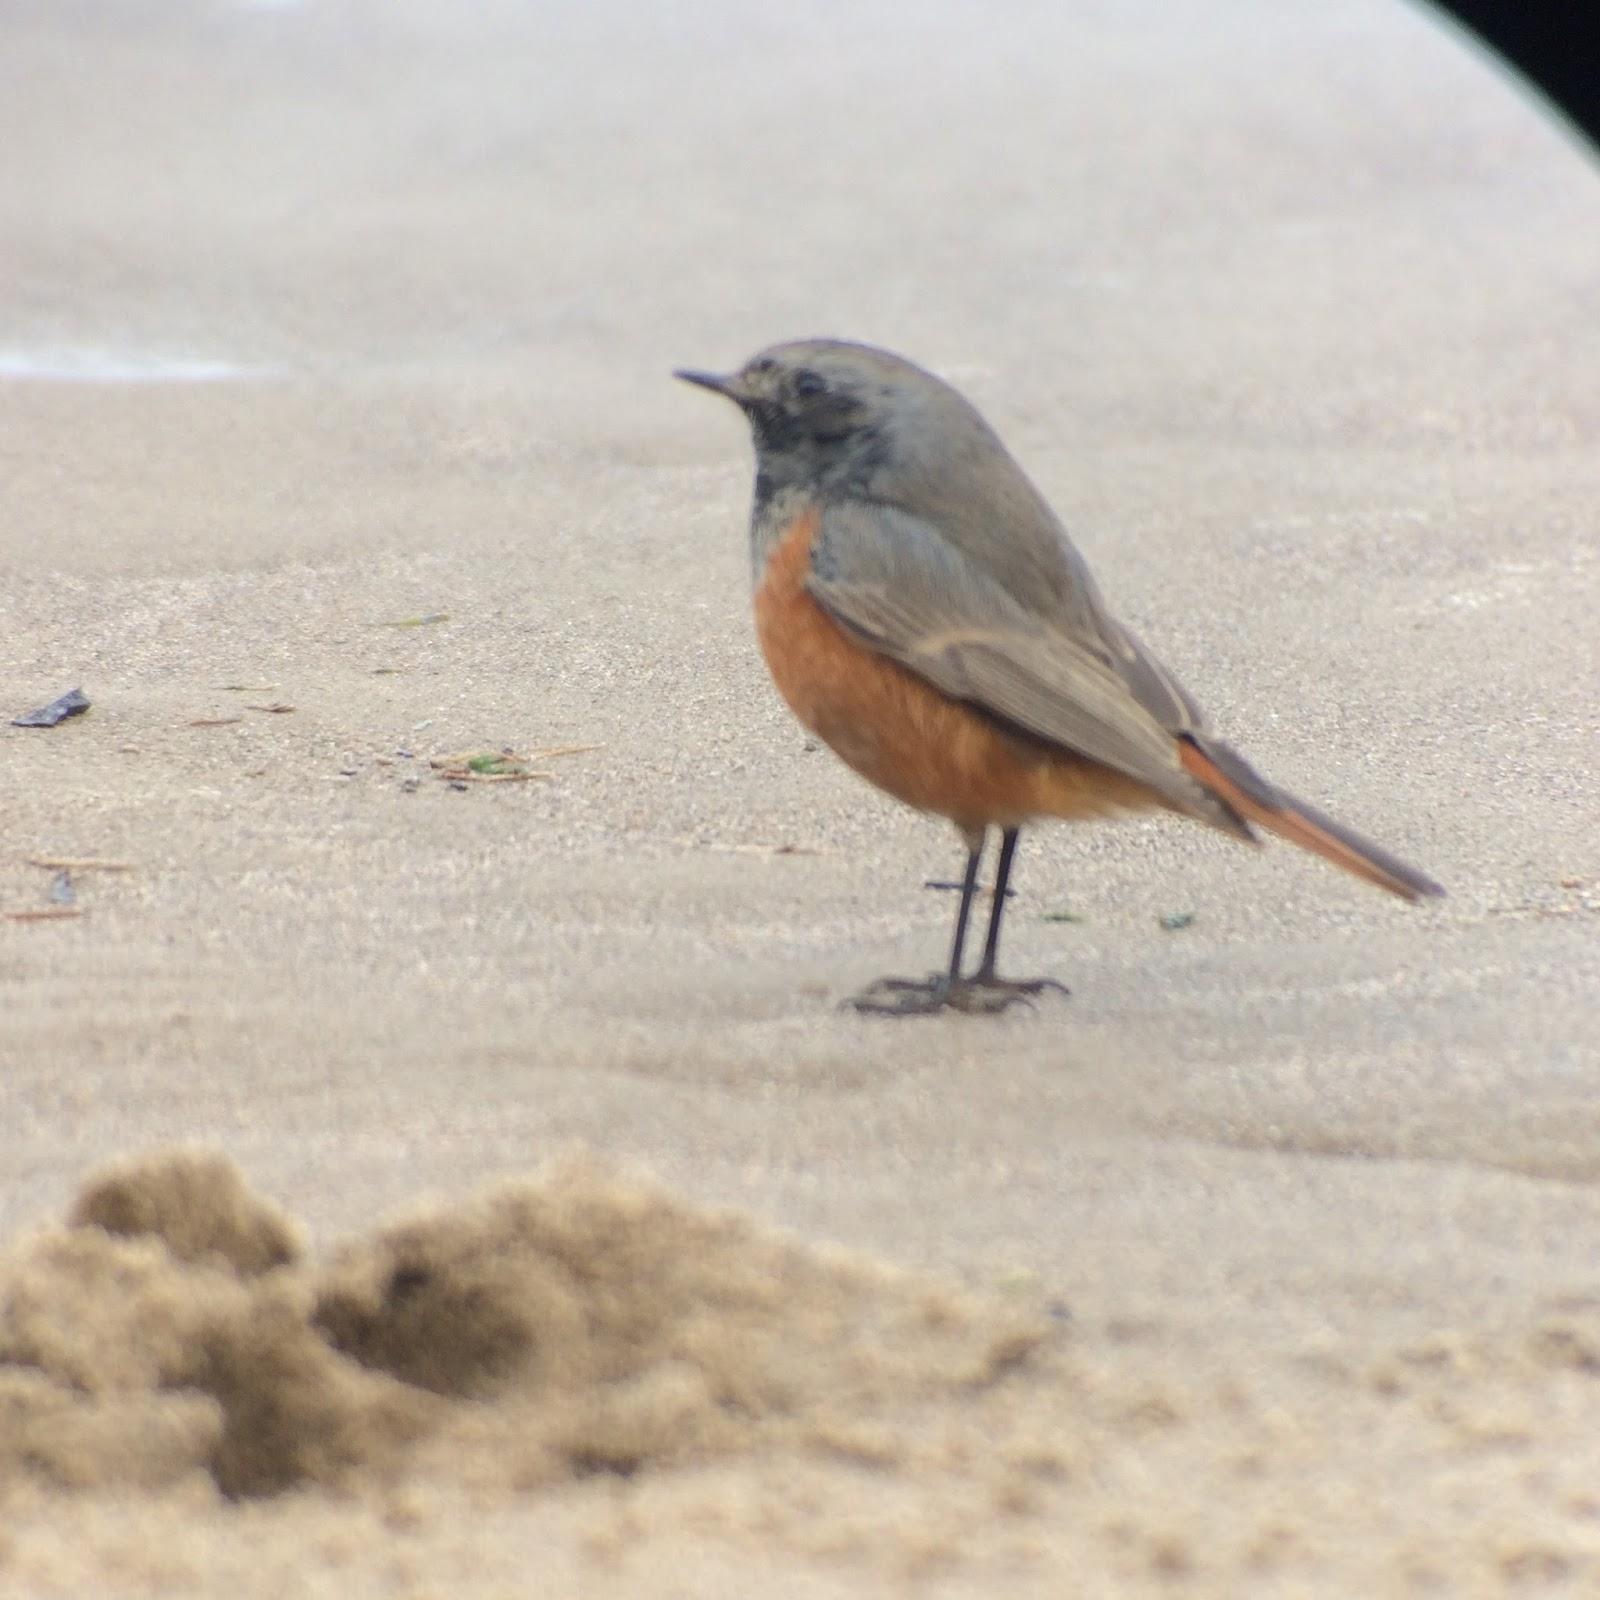 Eastern Black Redstart – A Christmas Twitch